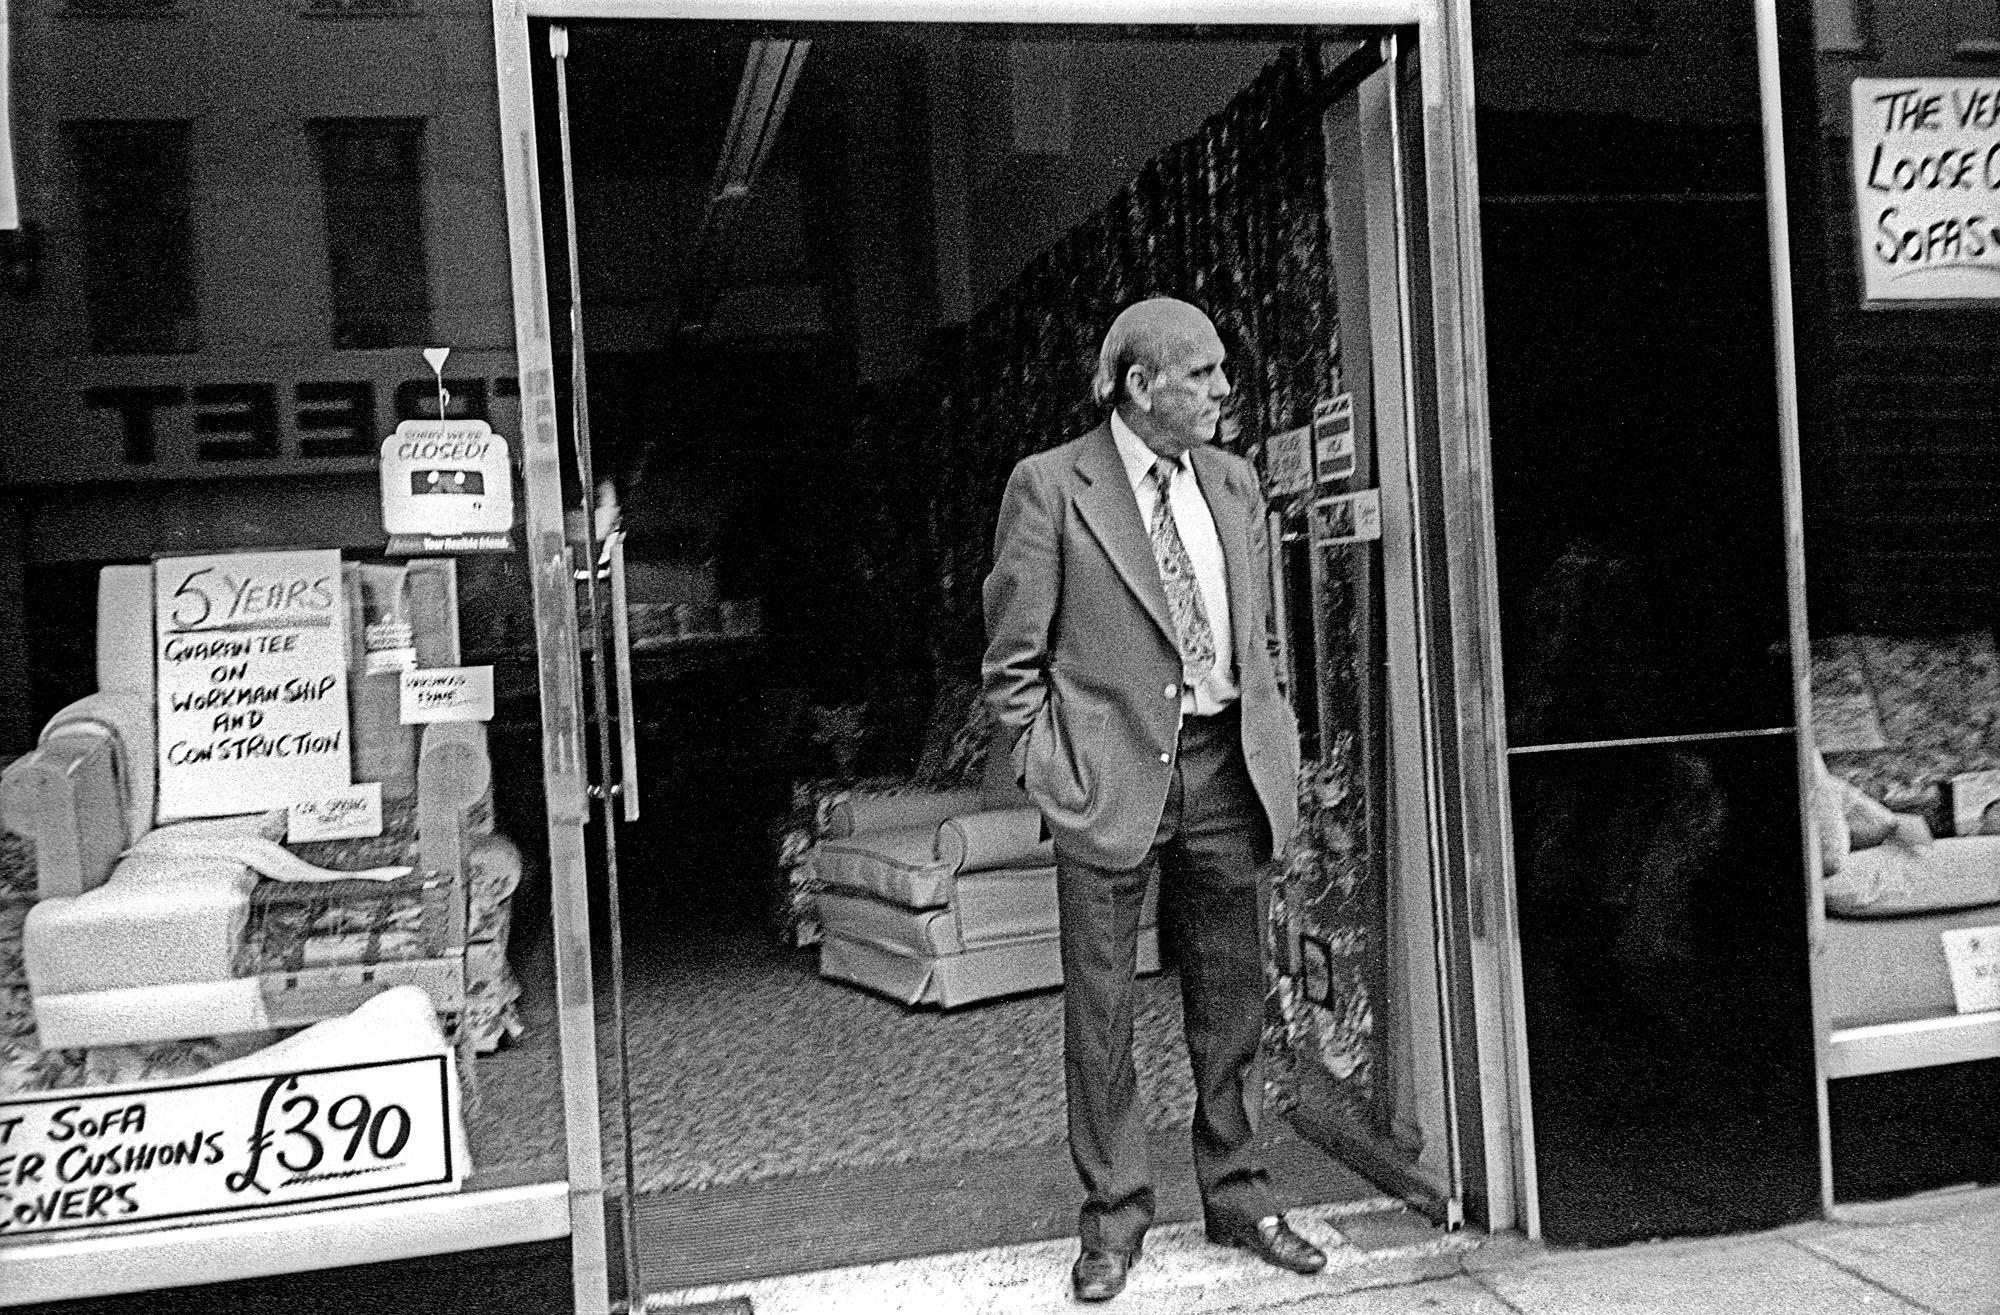 Kingsland High Street 1983